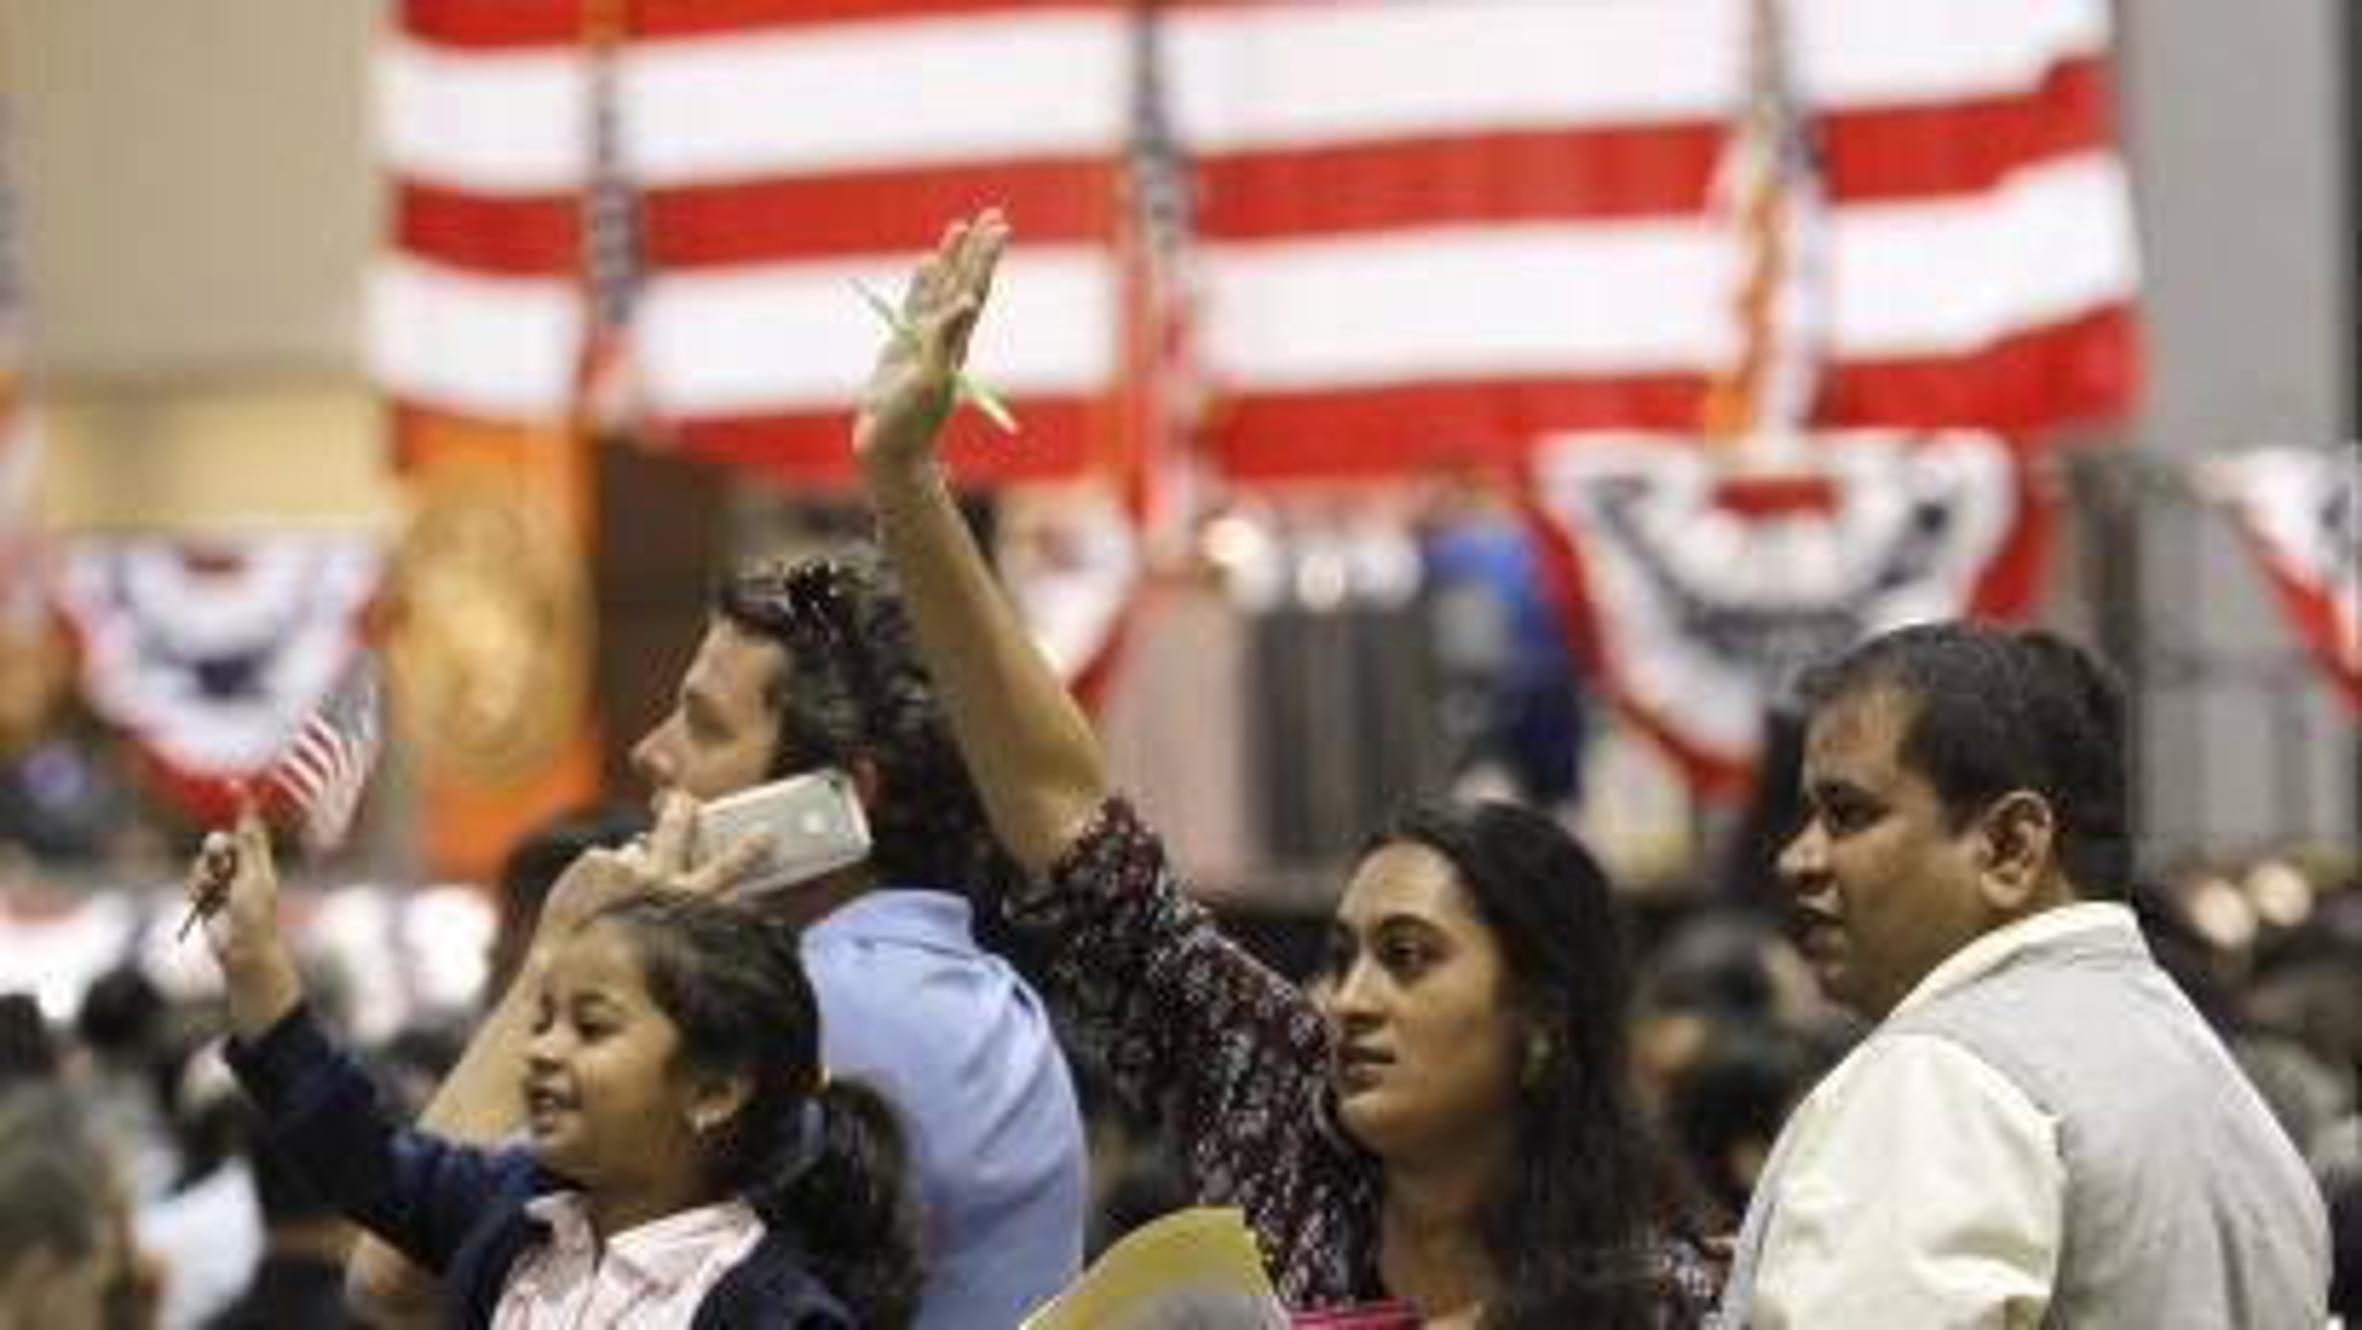 Sarika Vakil, her husband Tejas Vakil, originally from Mumbai, India wave during naturalization ceremonies in Los Angeles